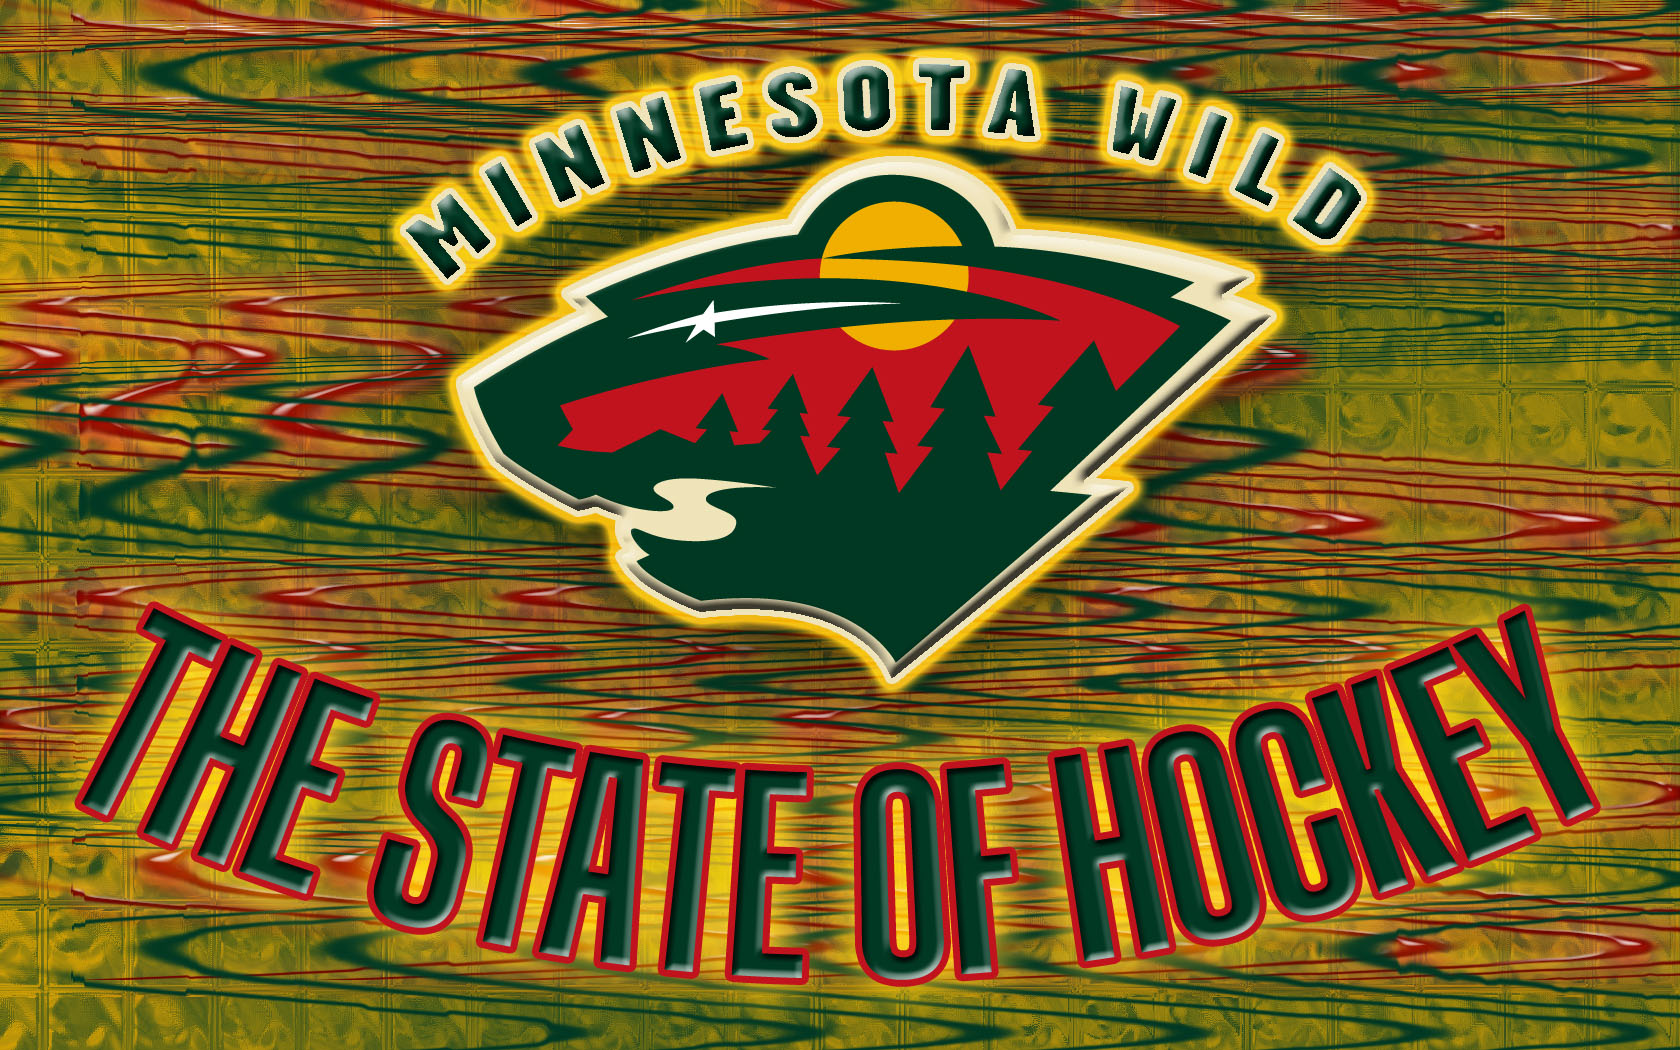 Minnesota wild wallpaper wallpapersafari - Minnesota wild logo ...